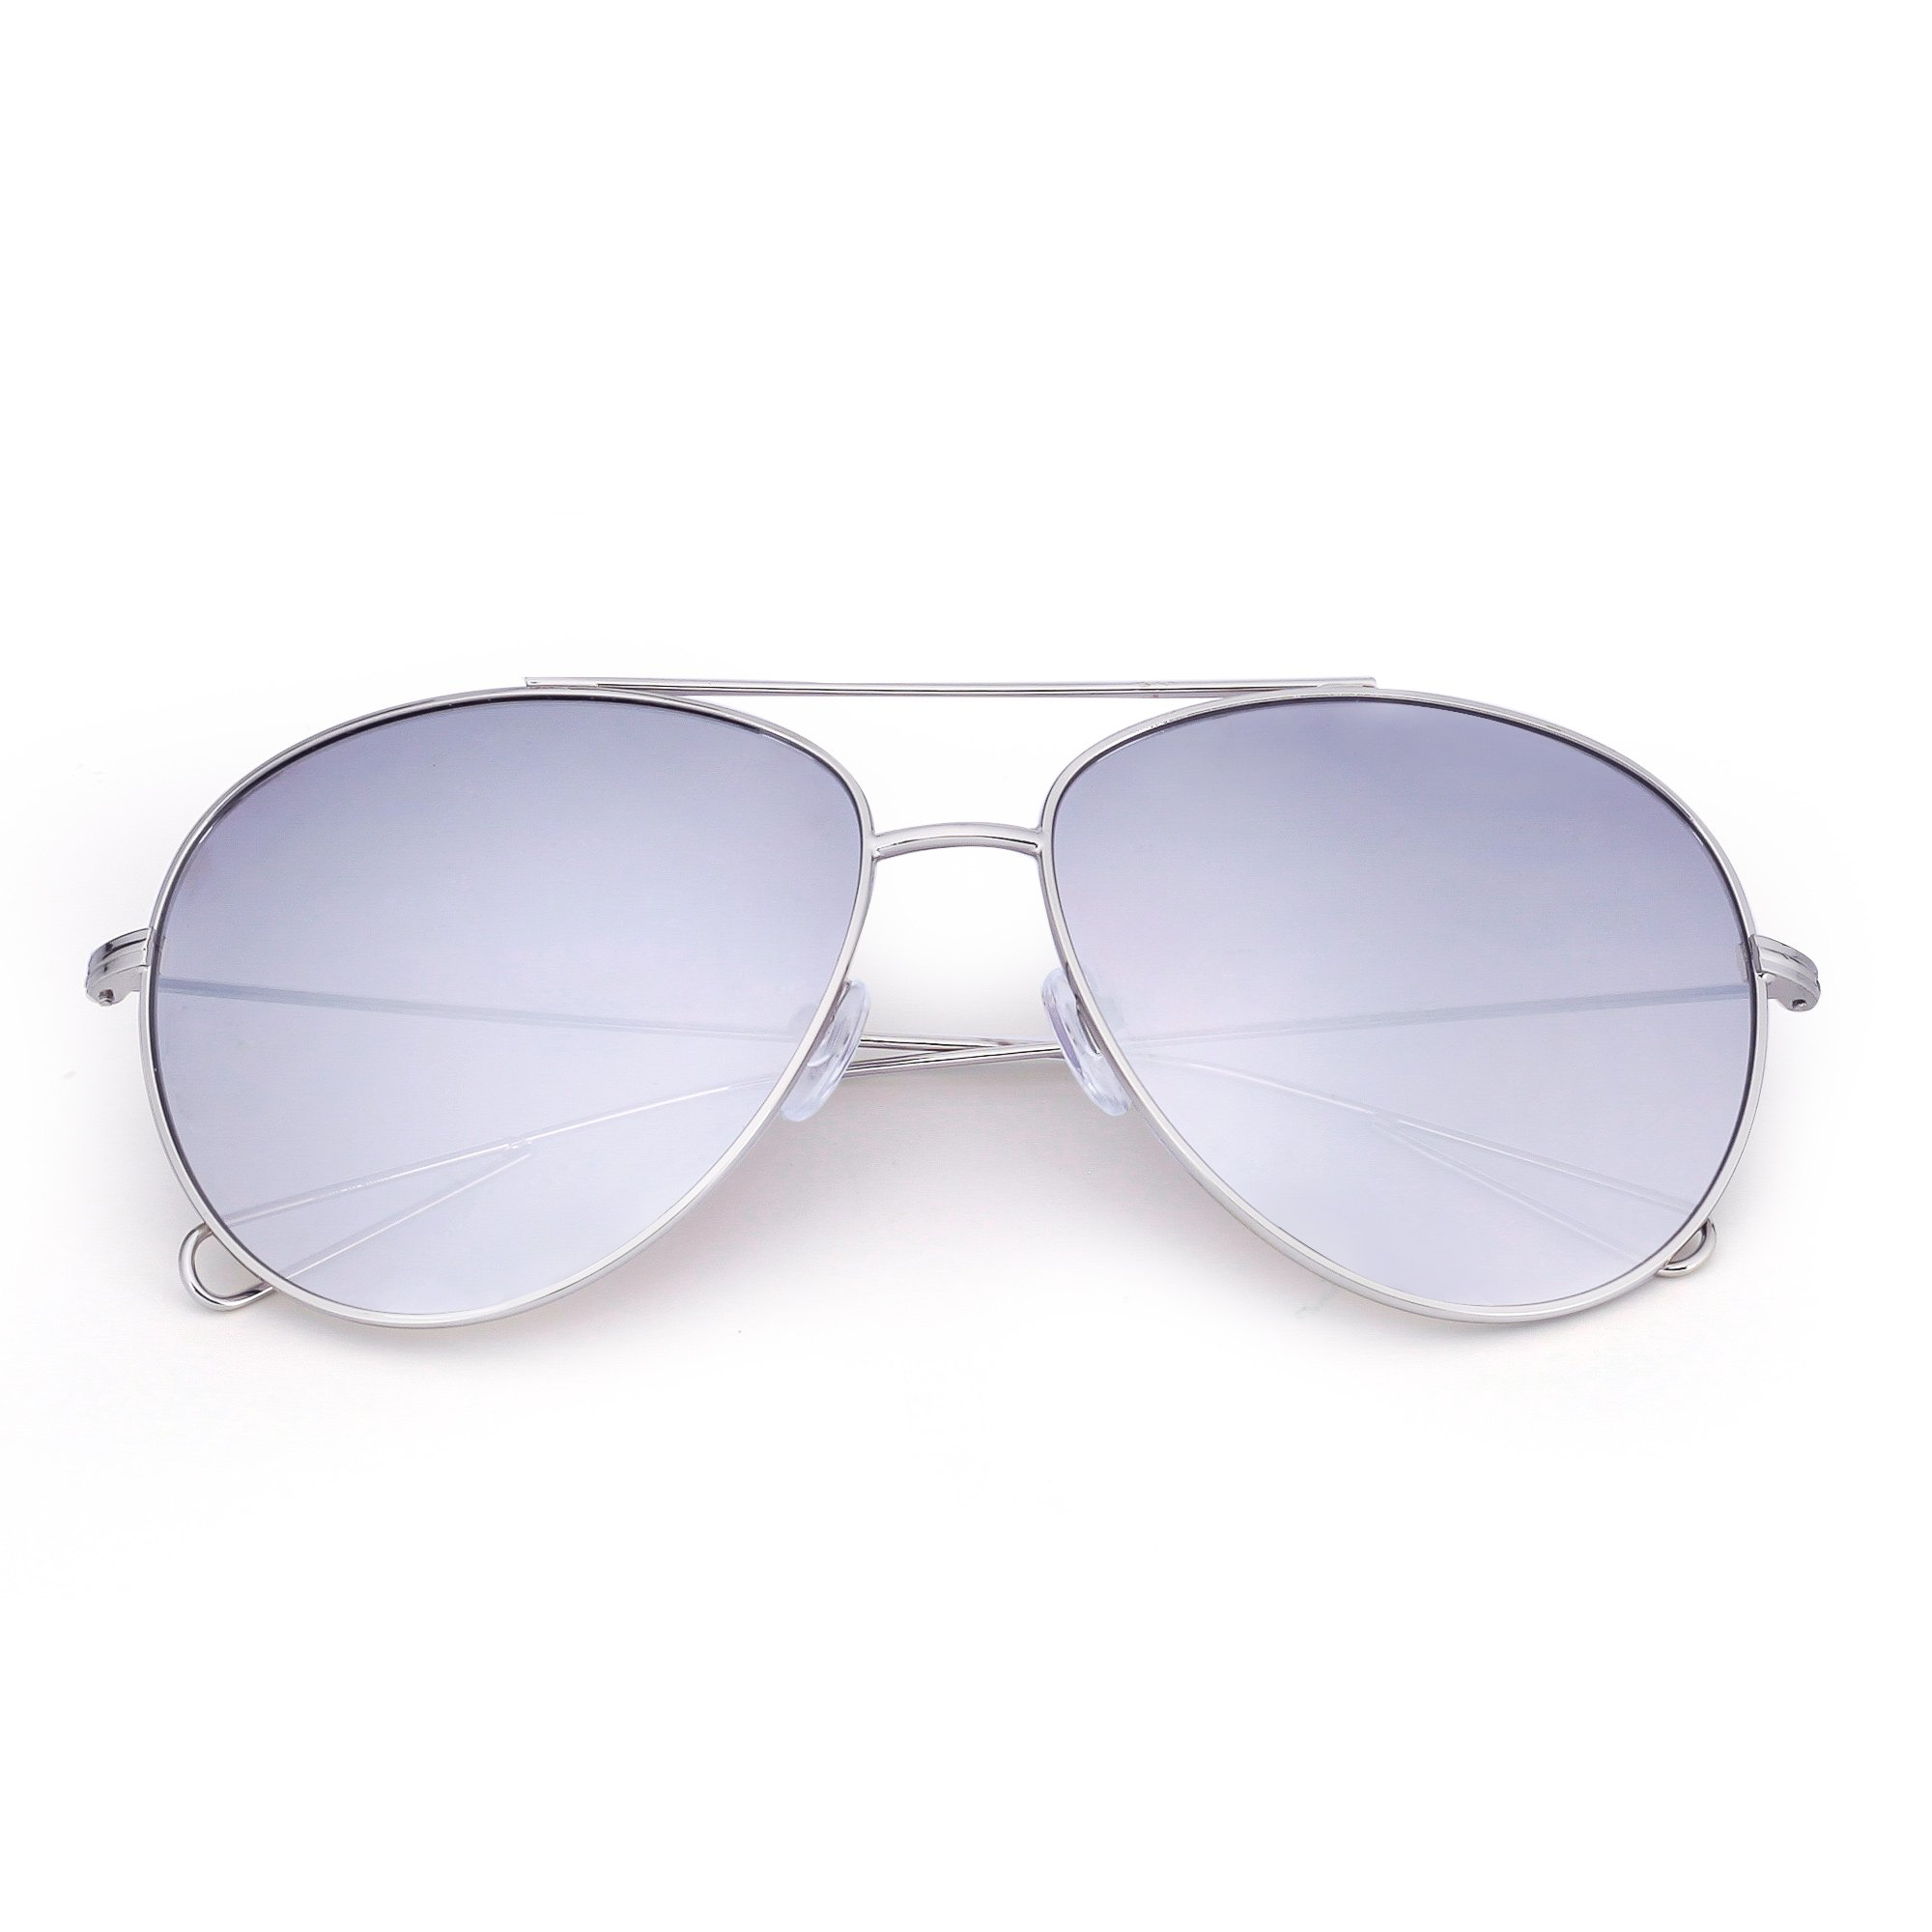 Oversized Aviator Sunglasses Men Women Double Bridge Hollow Temple Tips UV400 (Silver / Mirrored Sliver)